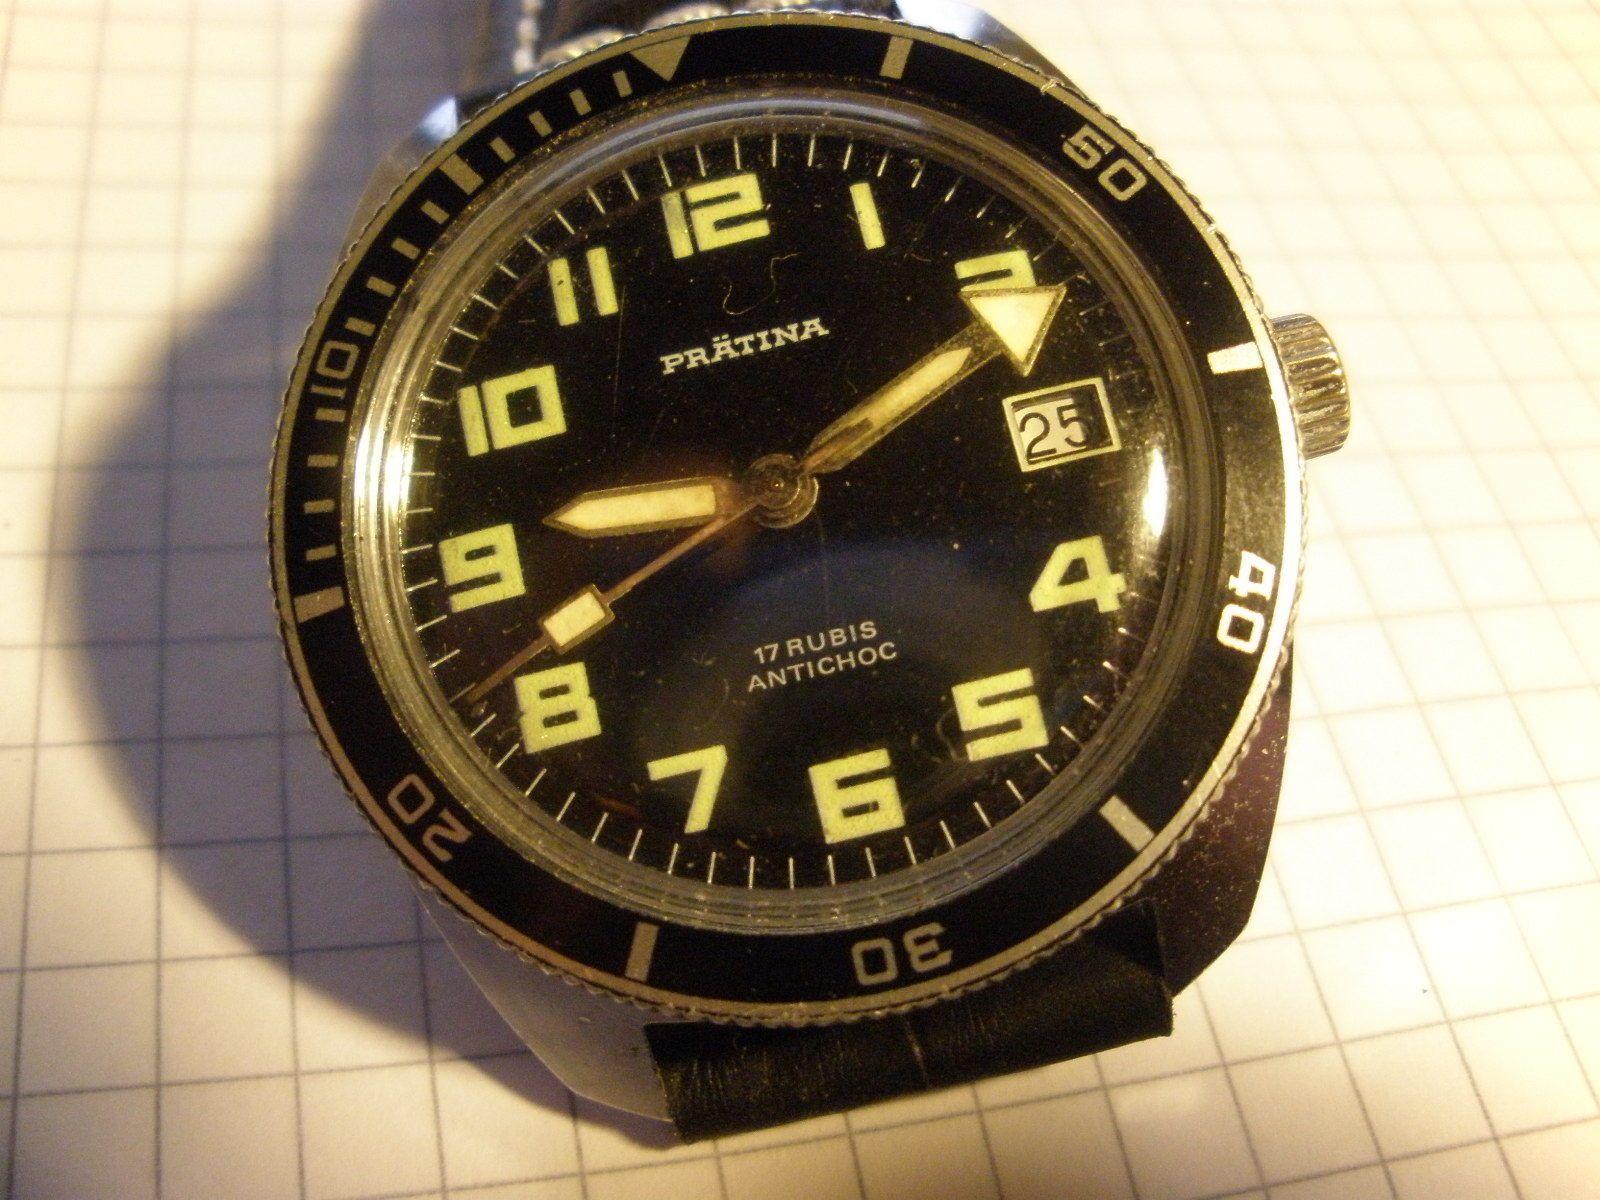 Prätina Jahre Diver 70er Armbanduhr Original Sammlerstück 4LqjRA35